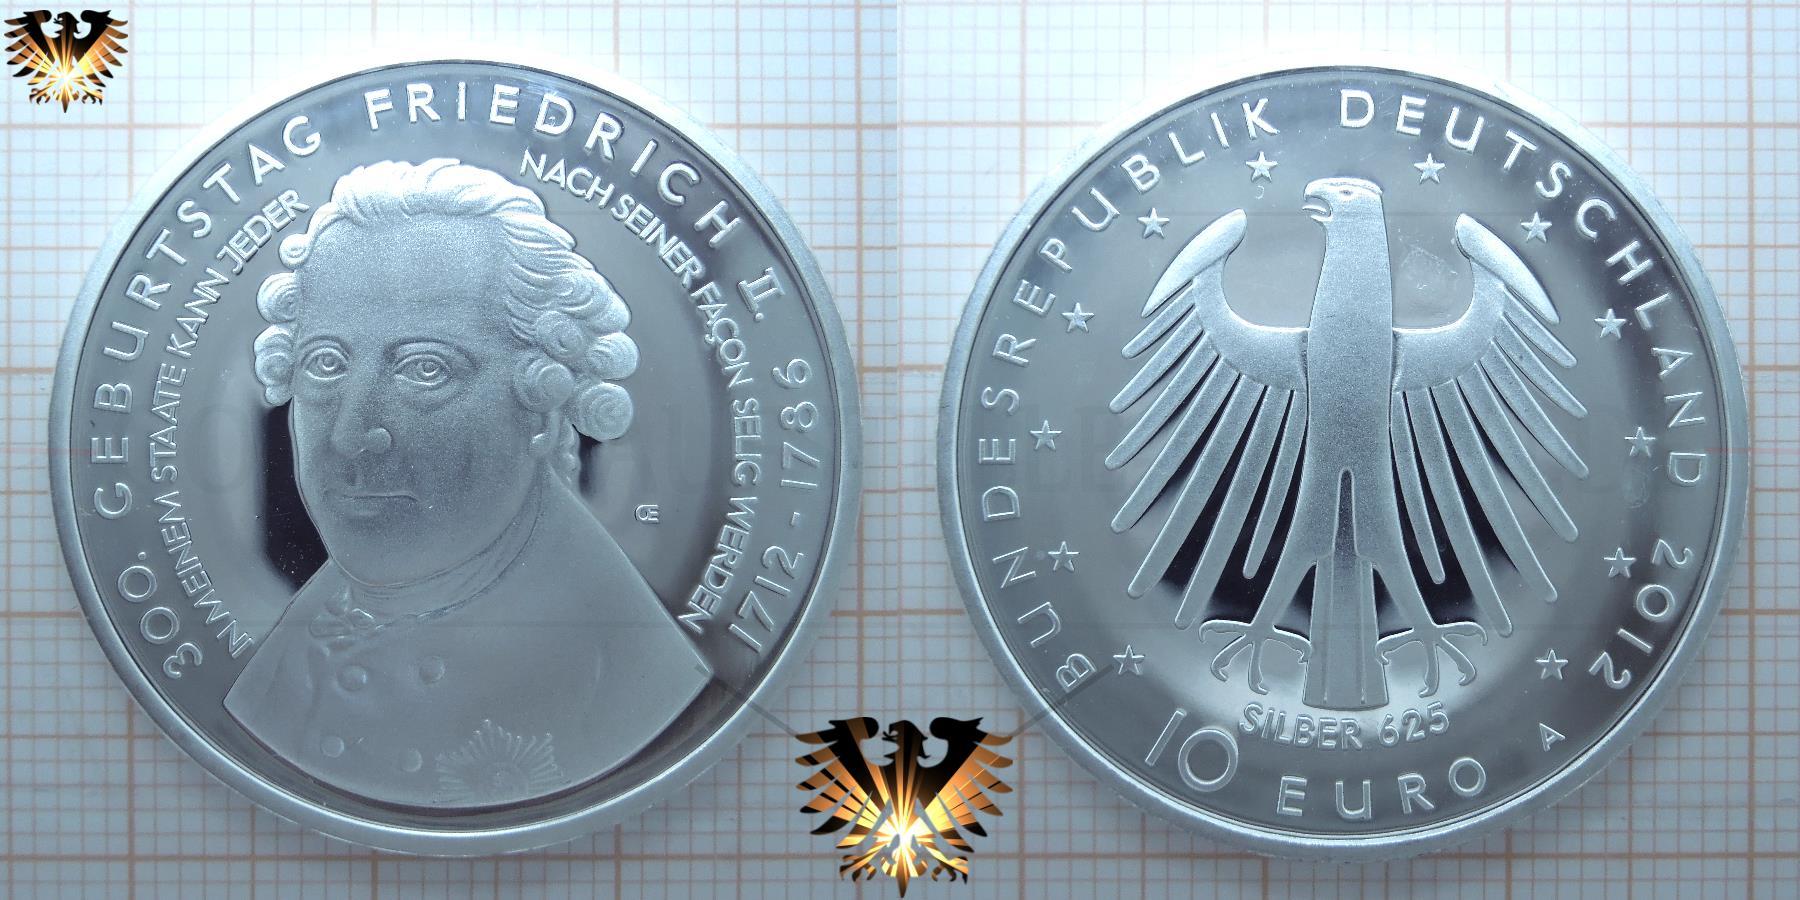 10 Euro Brd 2012 A 300 Geburtstag Friedrich Ii Gedenkmünze